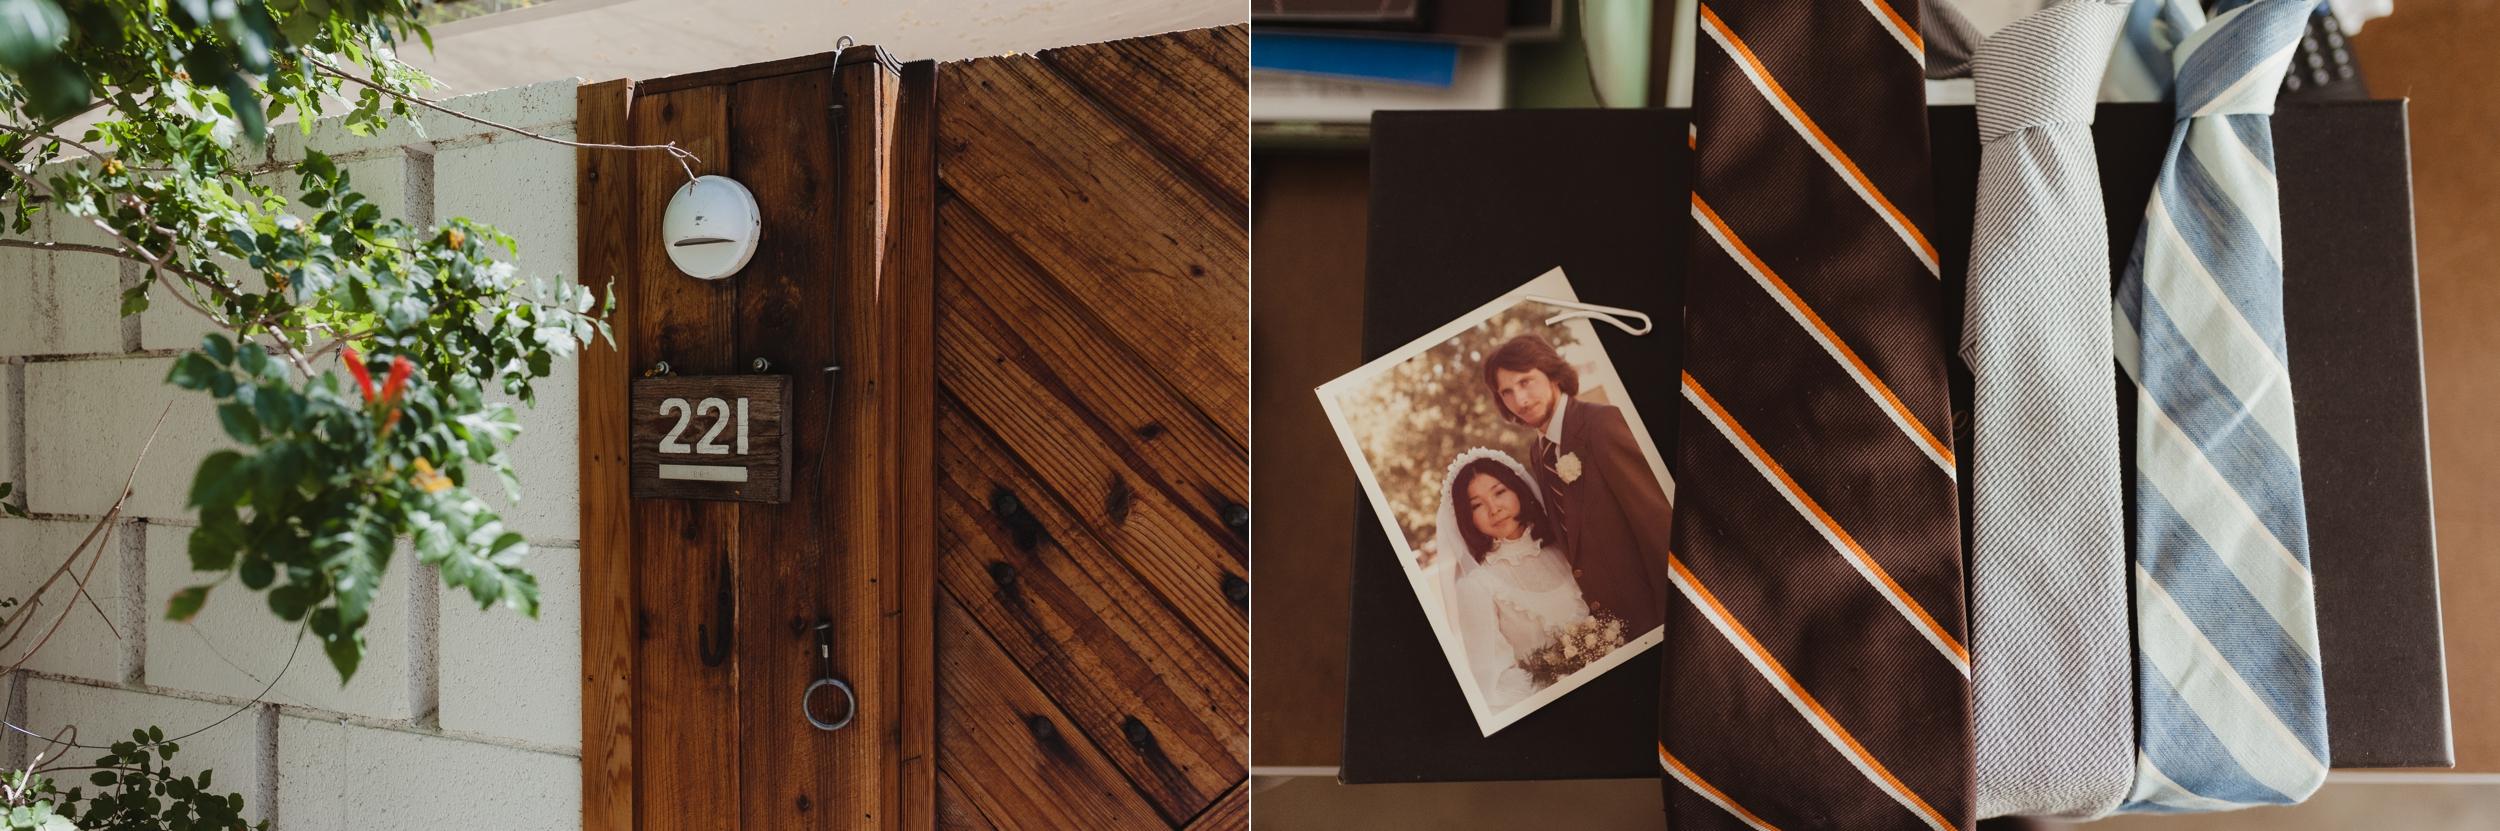 02-02-joshua-tree-ace-hotel-wedding-vivianchen-007_WEB.jpg